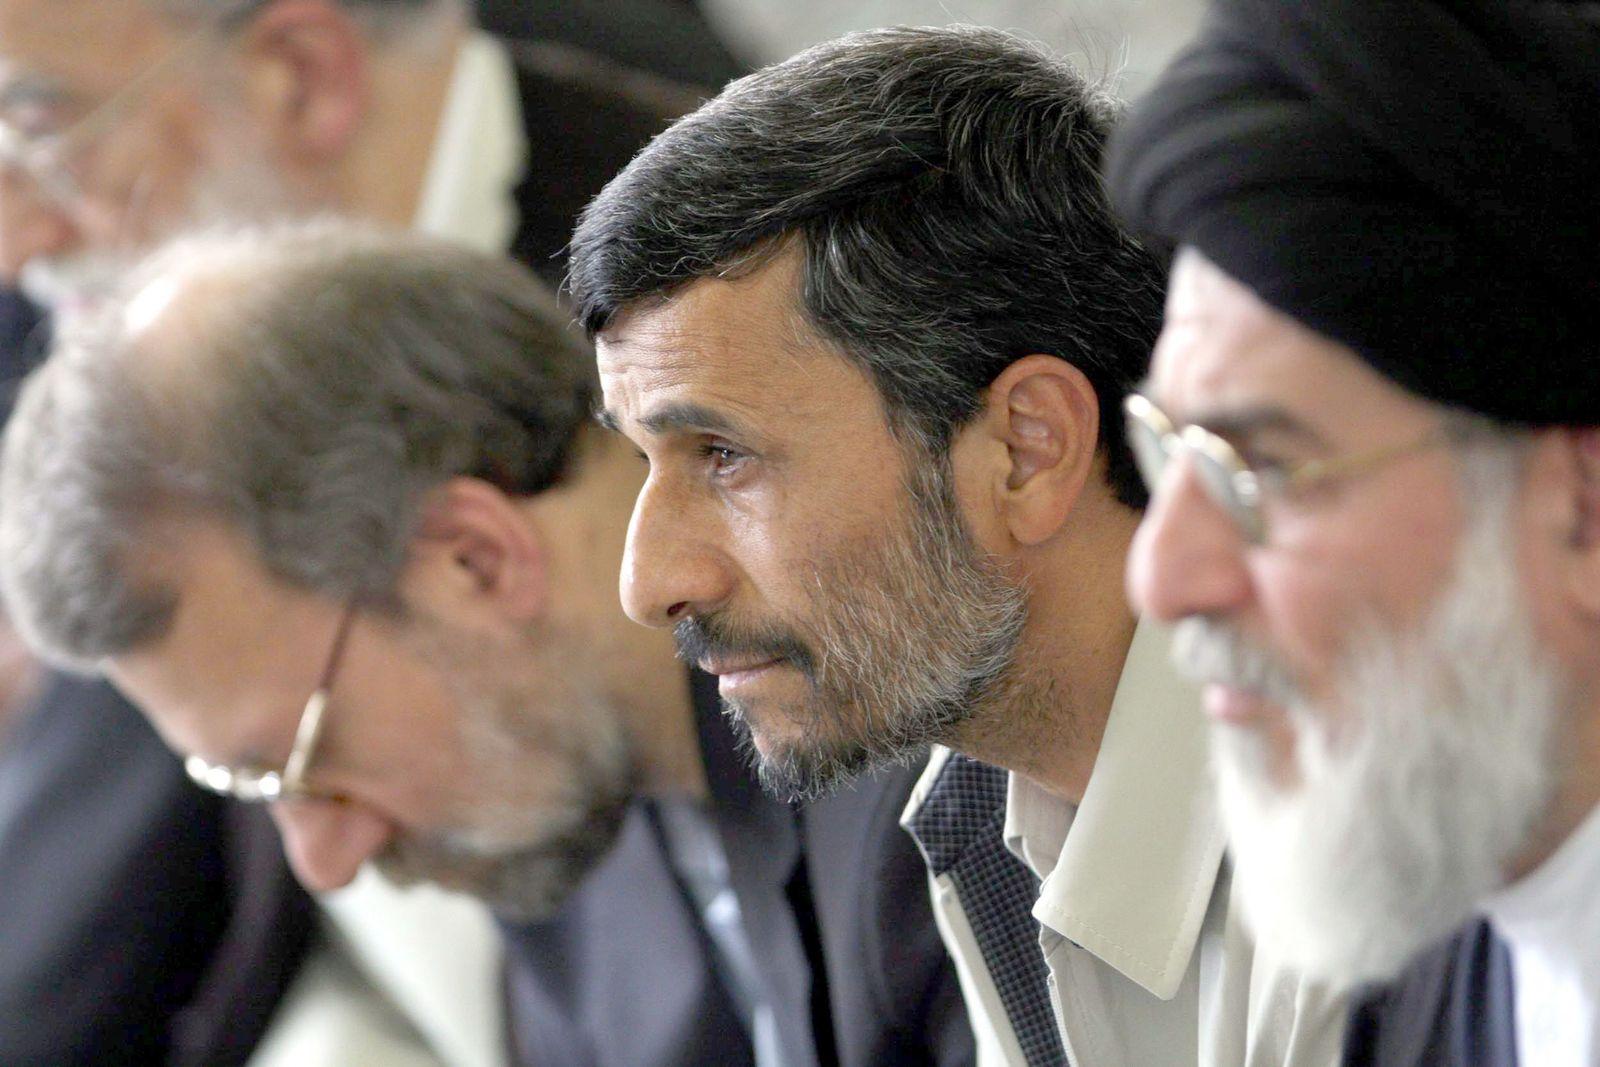 Ahmadinedschad beim Freitagsgebet